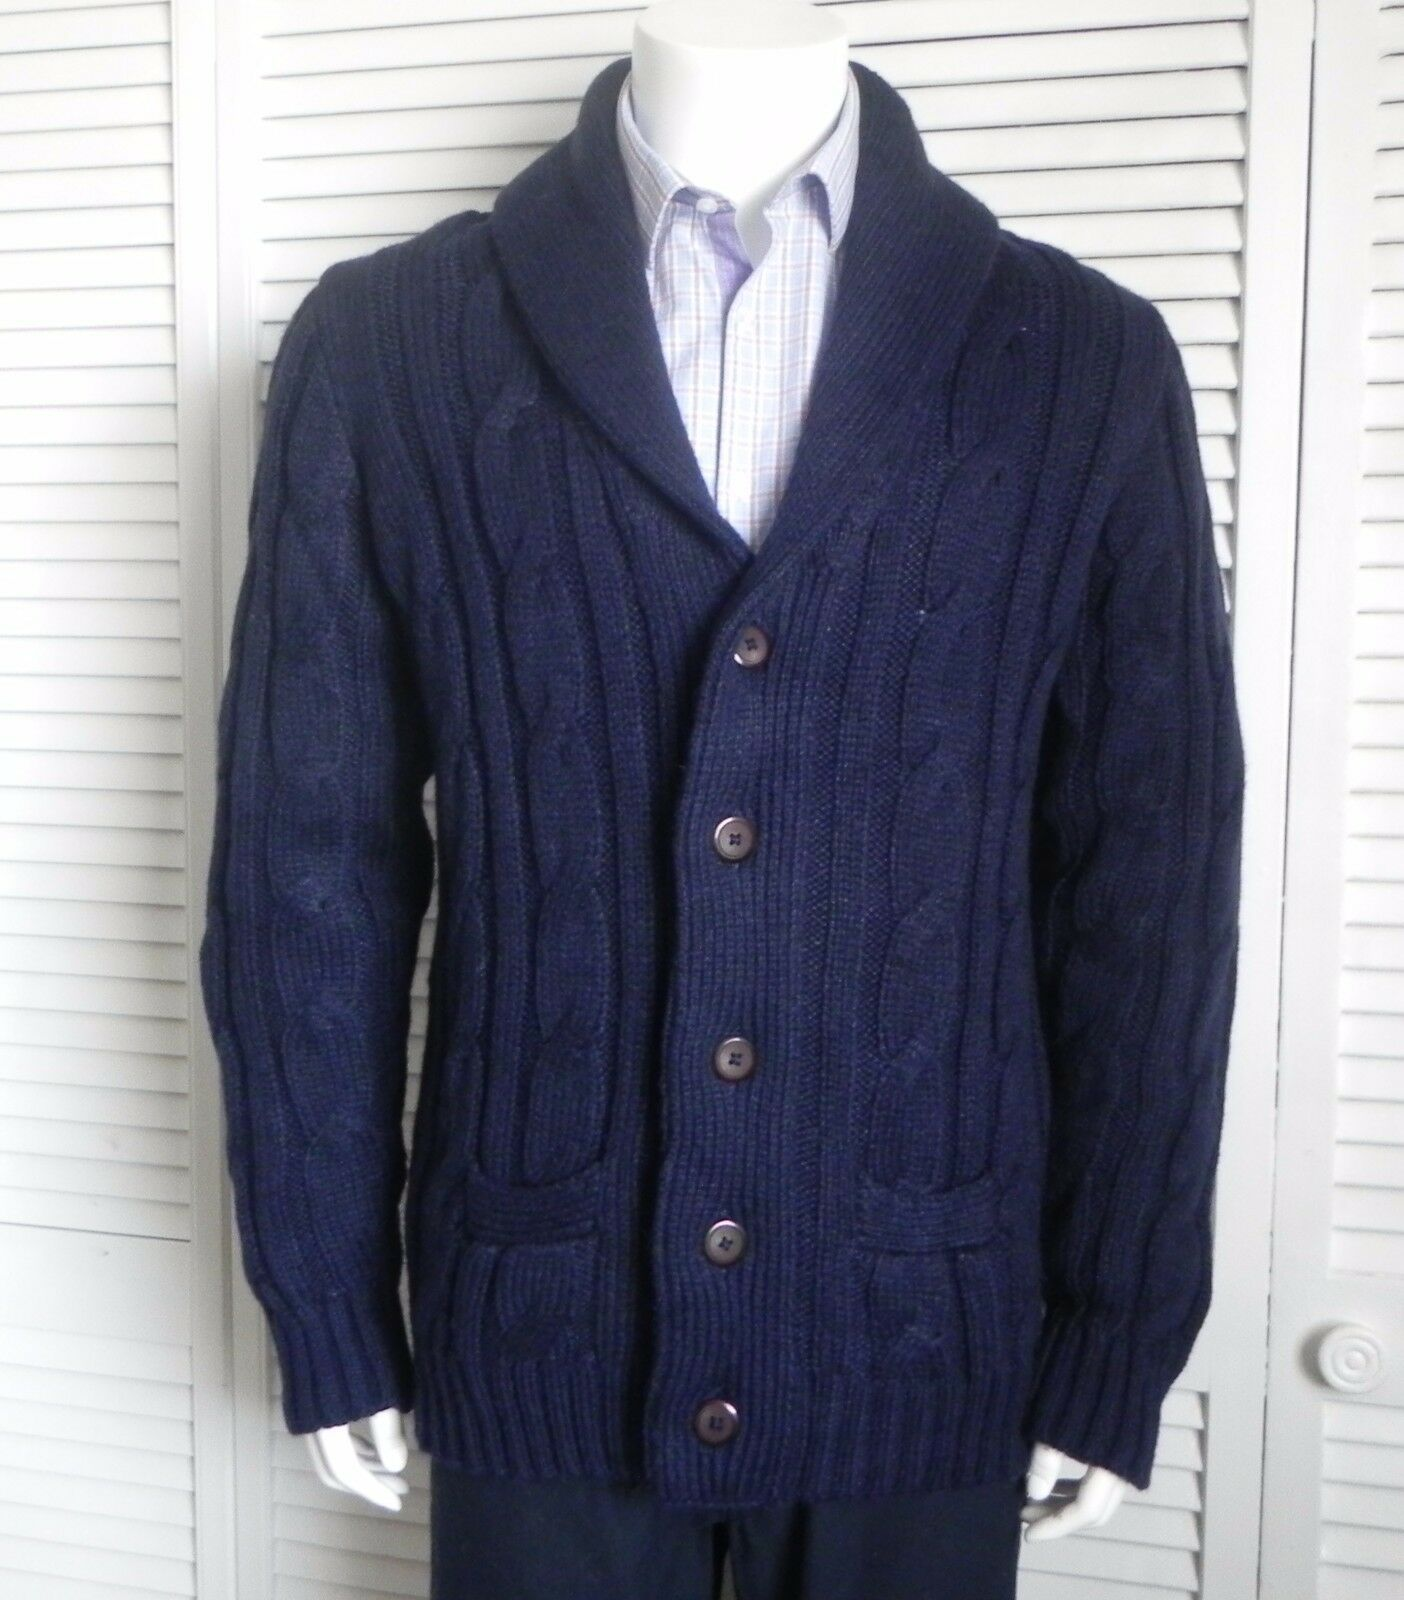 NEW Mens SIZE 3XL ALPACA Navy bluee Shawl Collar Cable Cardigan Knit Sweater PERU